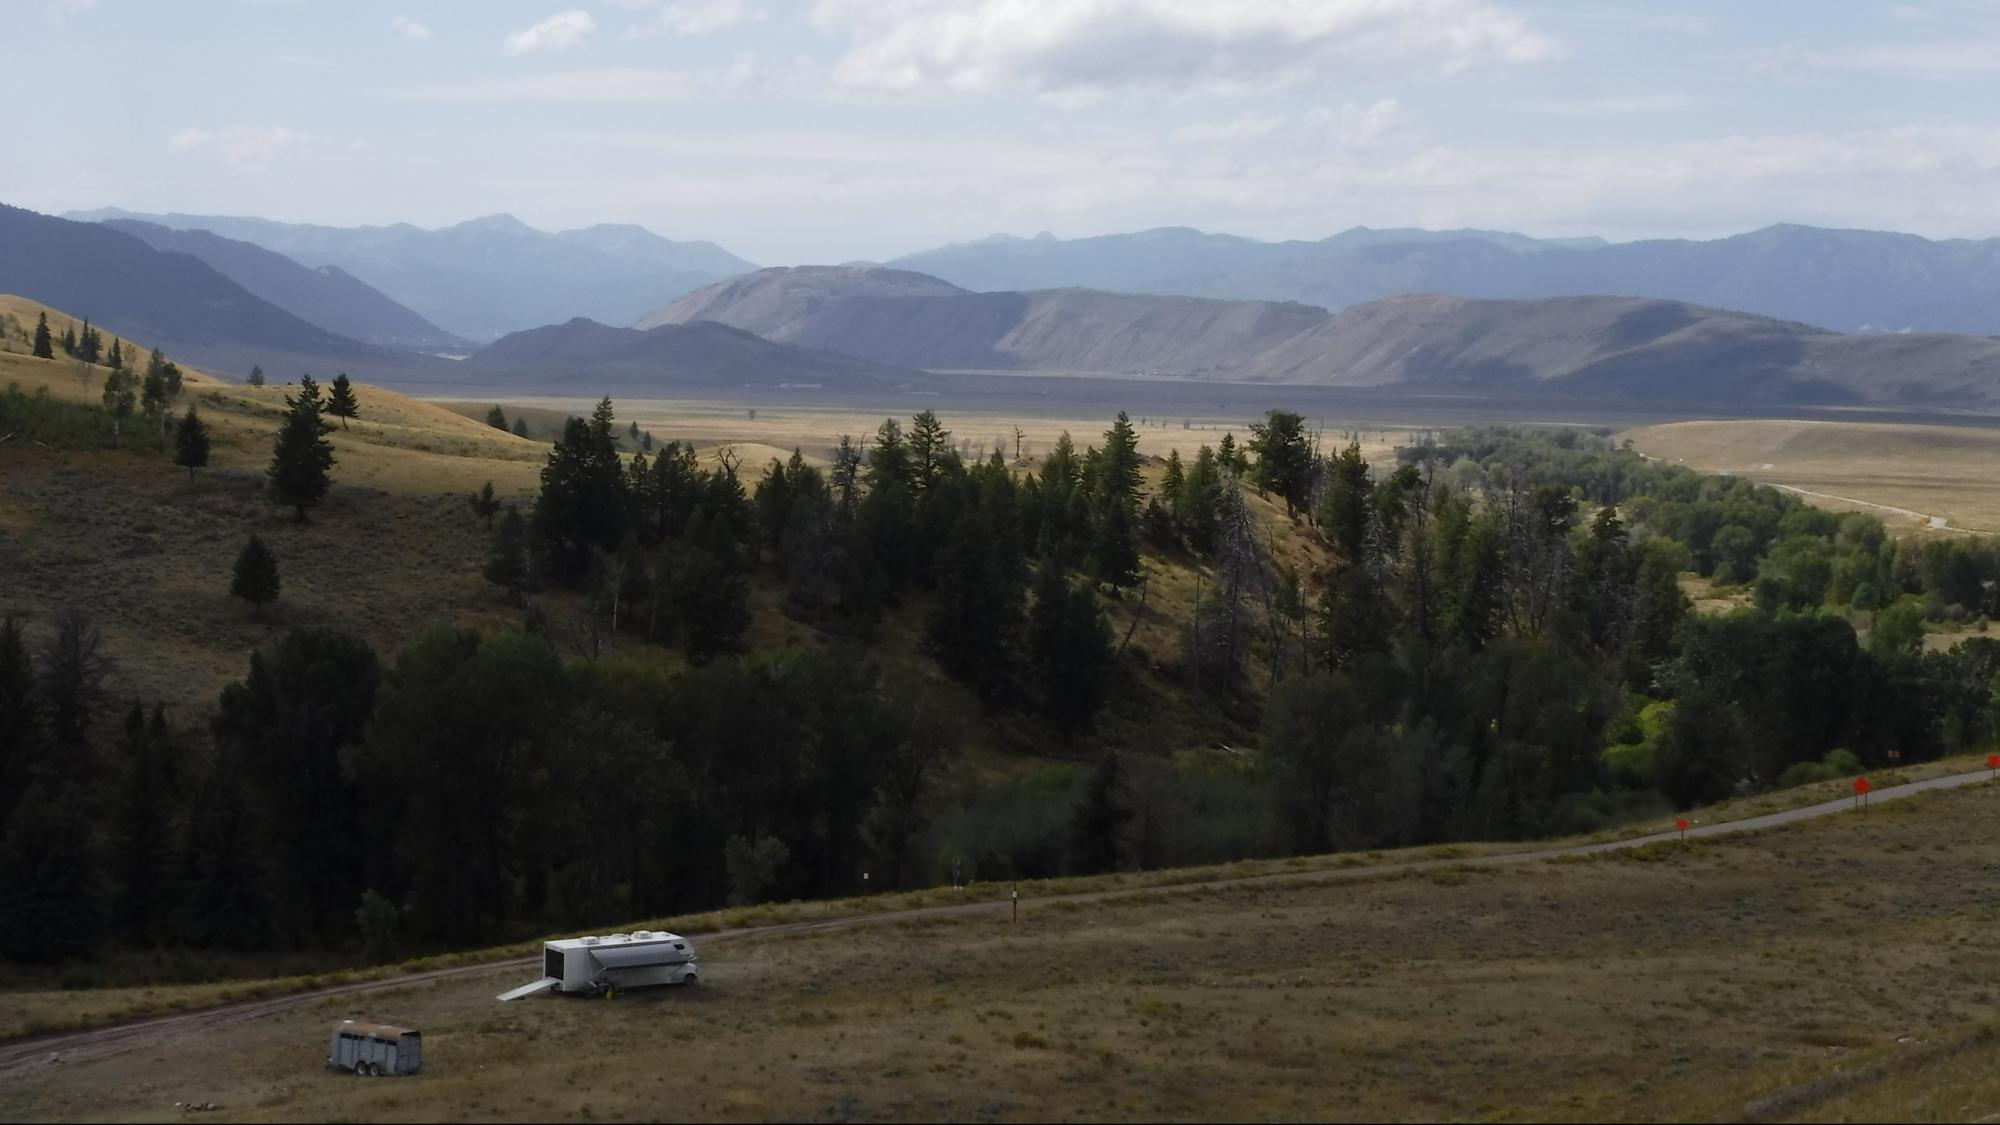 Edge of the Elk Preserve